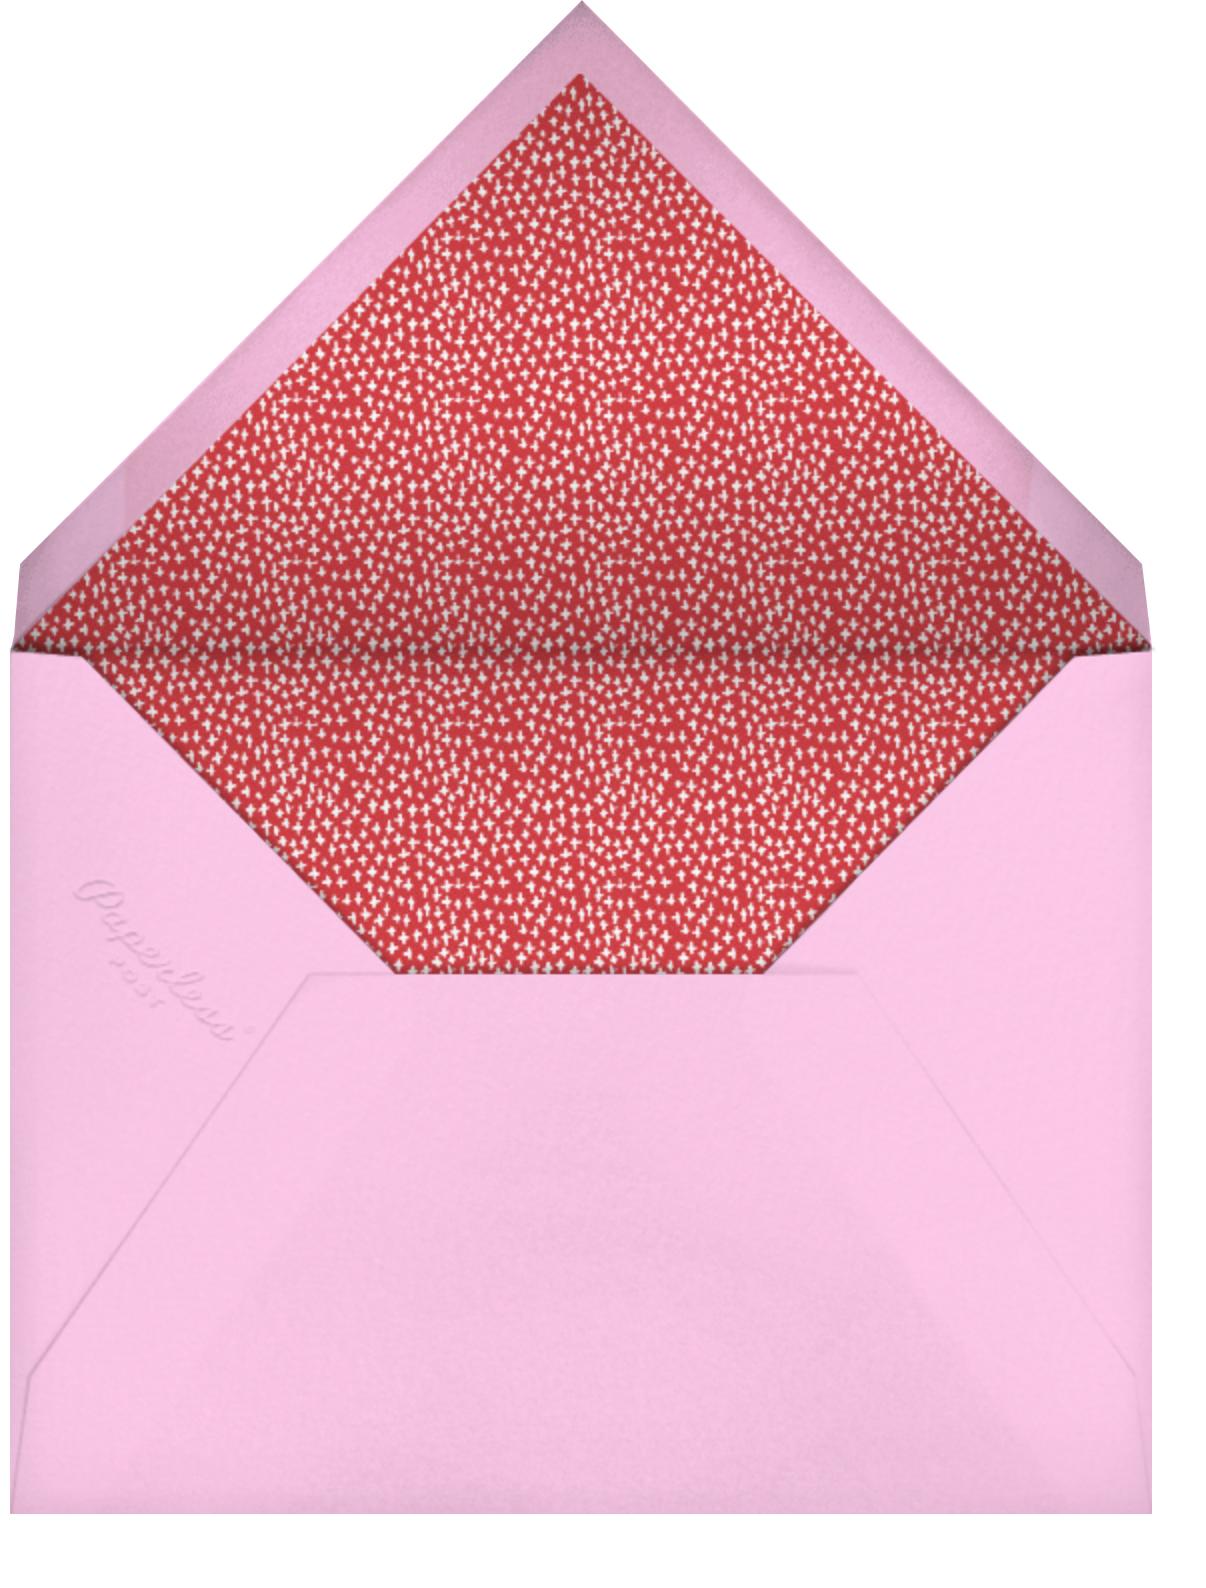 Throwback - Mr. Boddington's Studio - Envelope